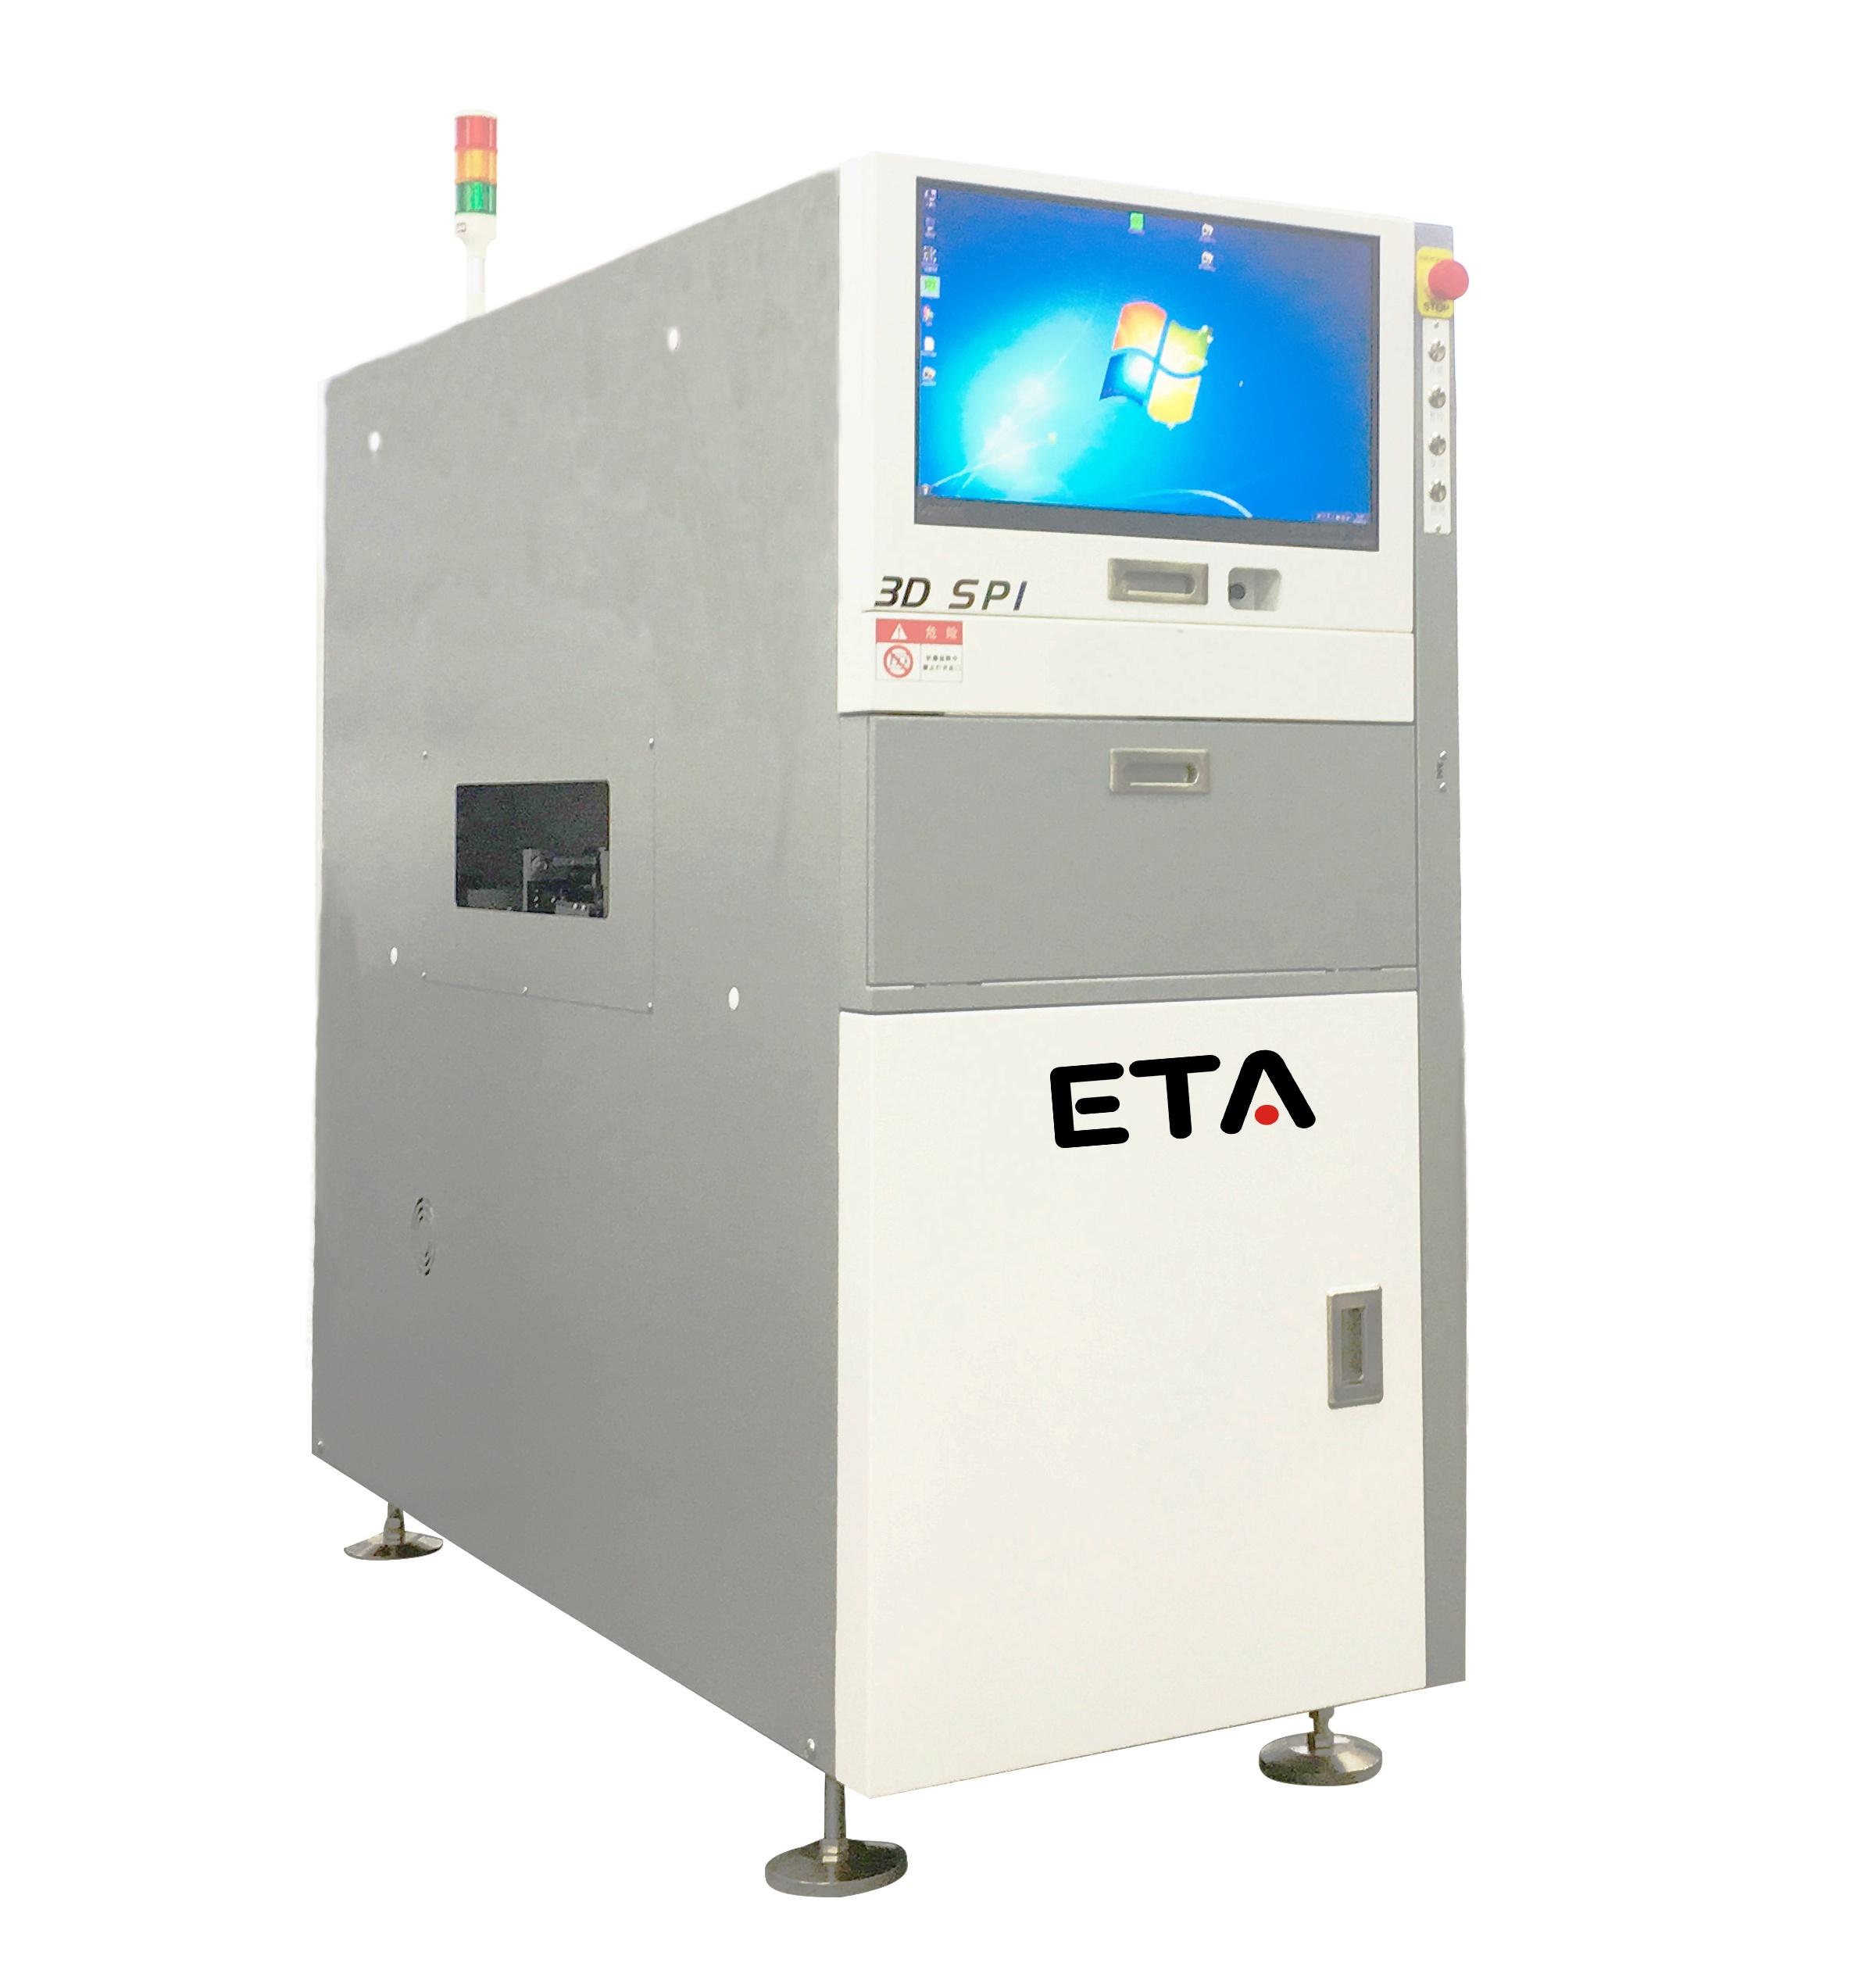 Advanced Auto SMT On-line 3D Solder Paste Inspection Machine (SPI)